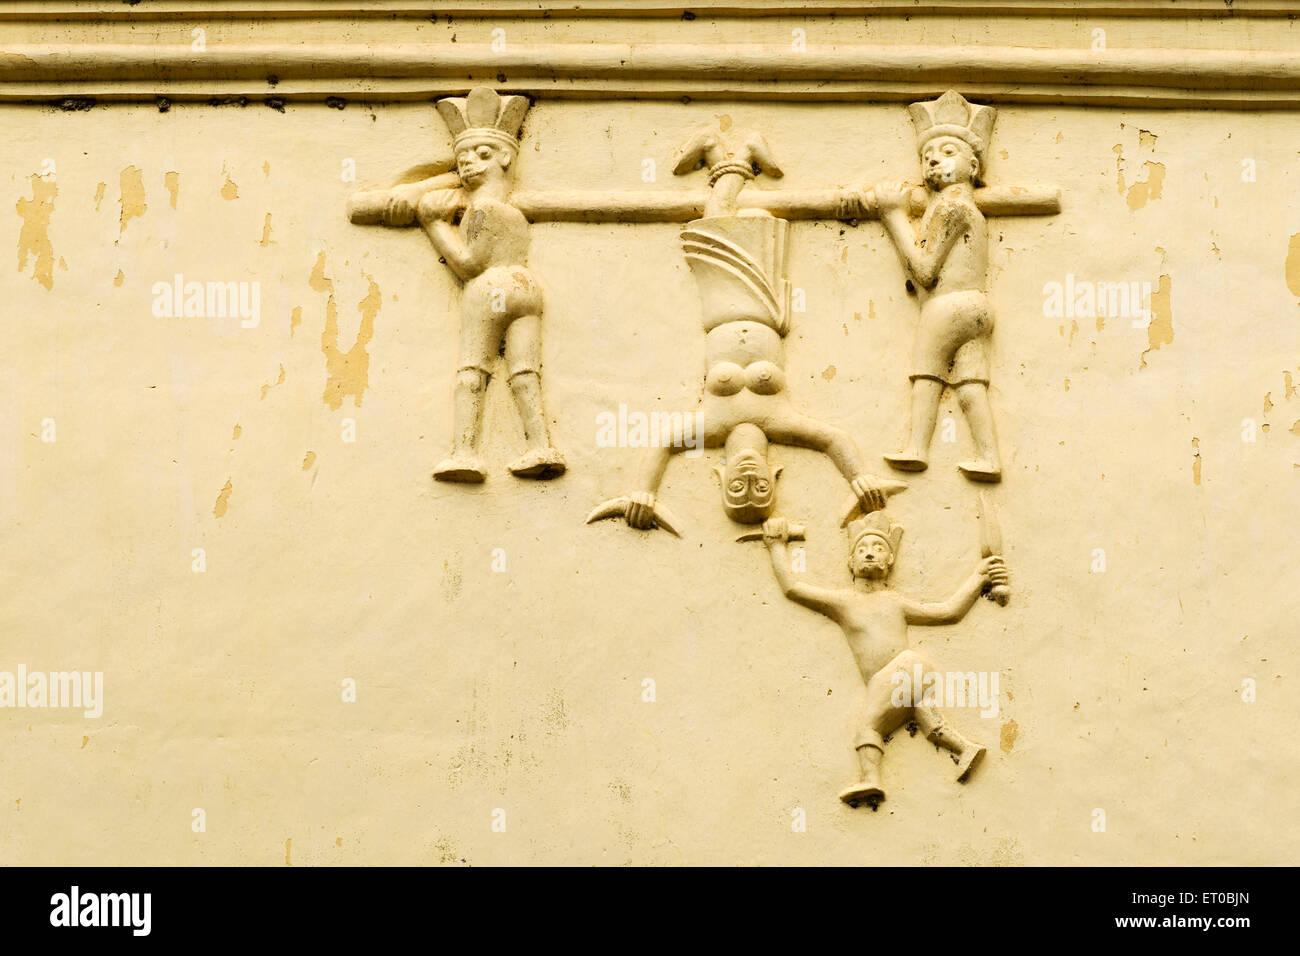 Stucco works on exterior wall of Mar Sabore Afroth Jacobite Syrian church at Akapparambu  ; Kerala ; India - Stock Image